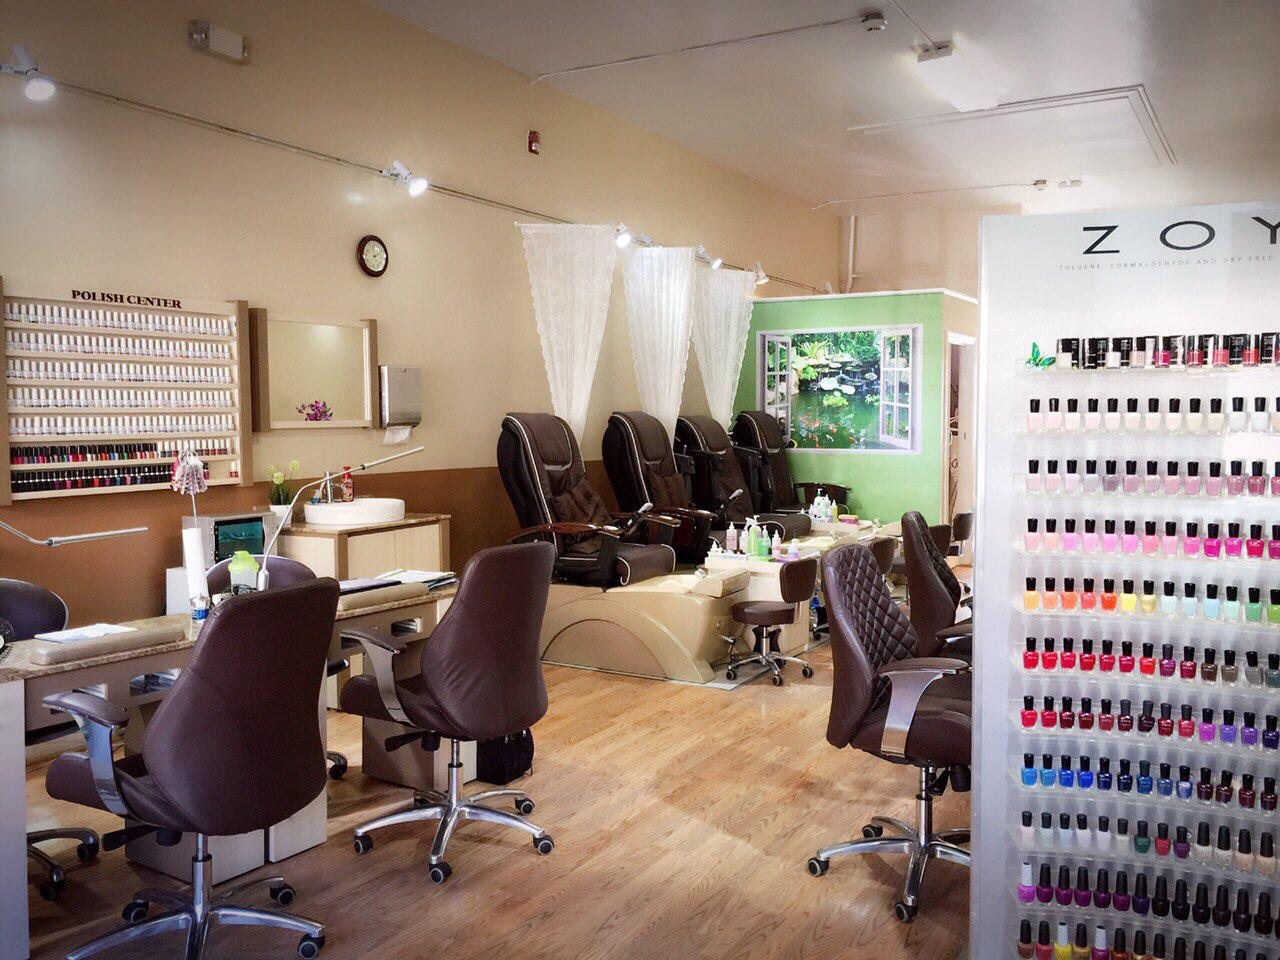 Divine Organic Nail Salon - Nail Salon, Nails, Manicure, Pedicure